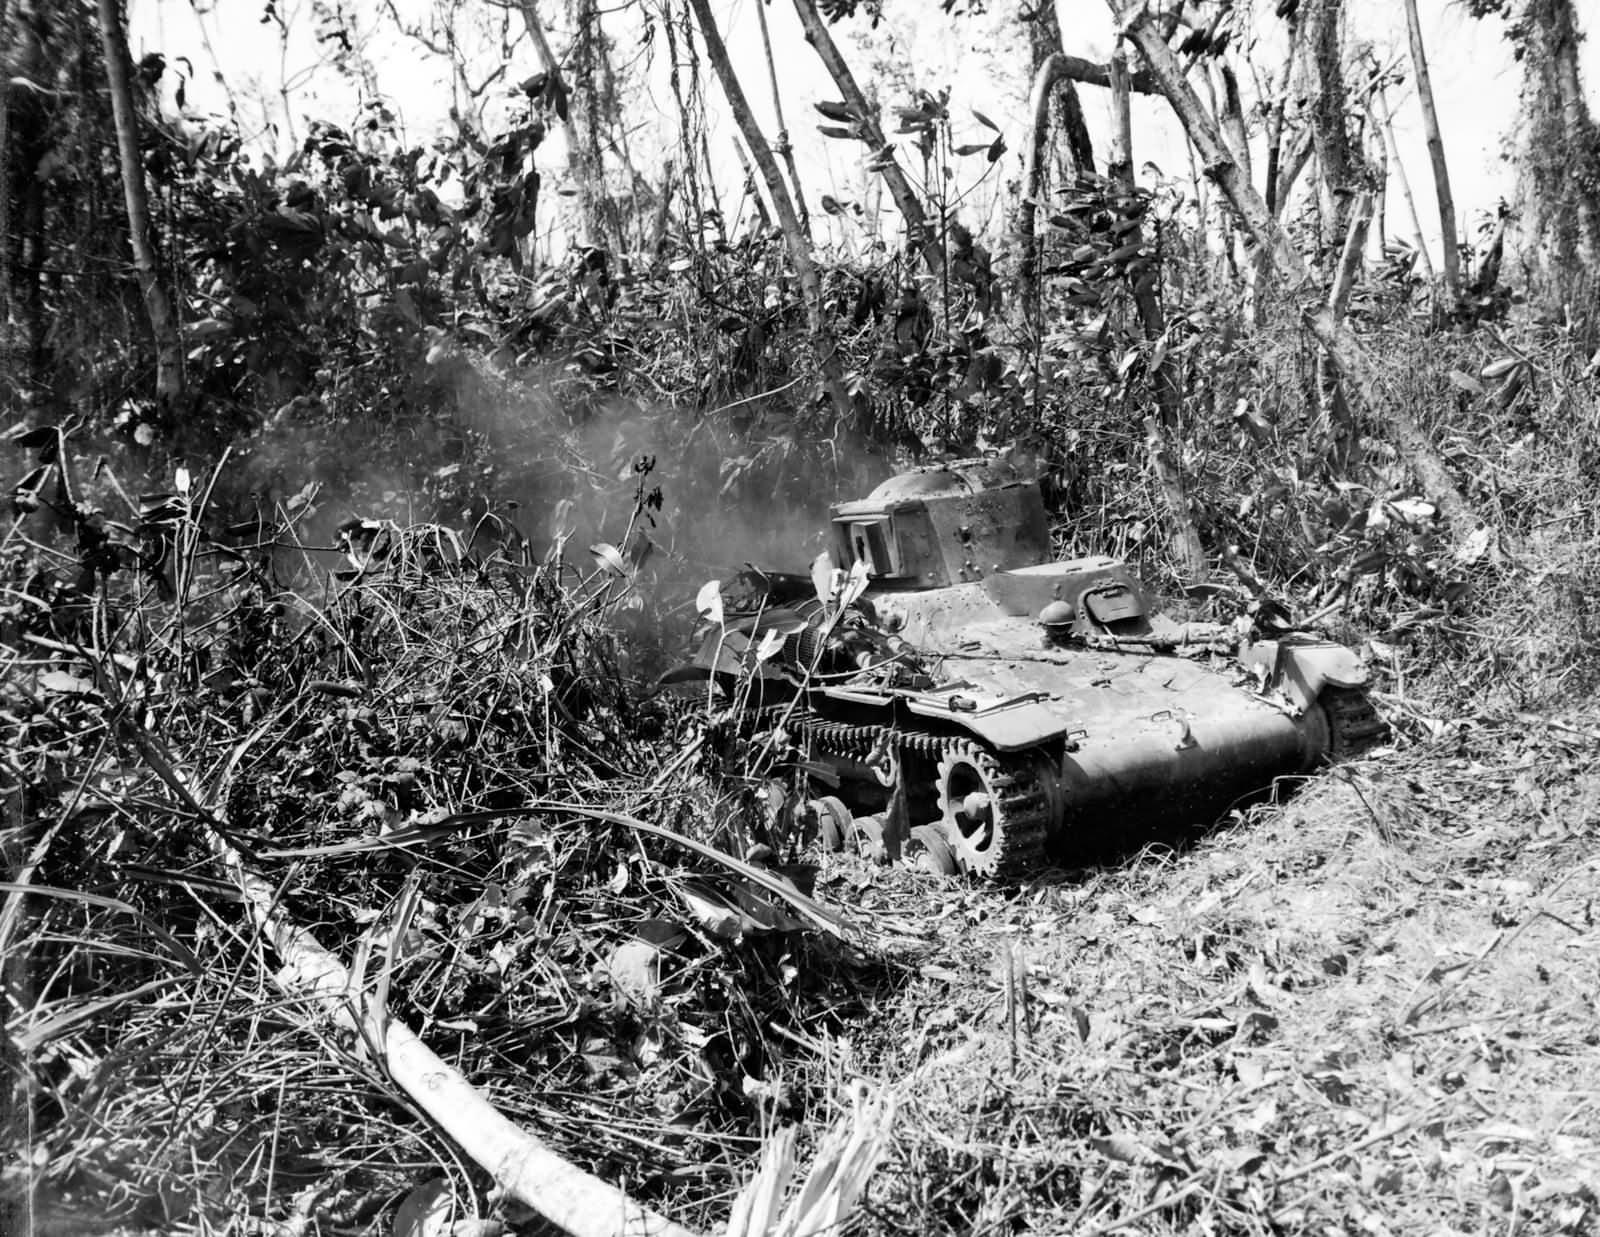 Japanese Type 97 Te Ke tankette destroyed by 4th Marine Division Kwajalein 1944